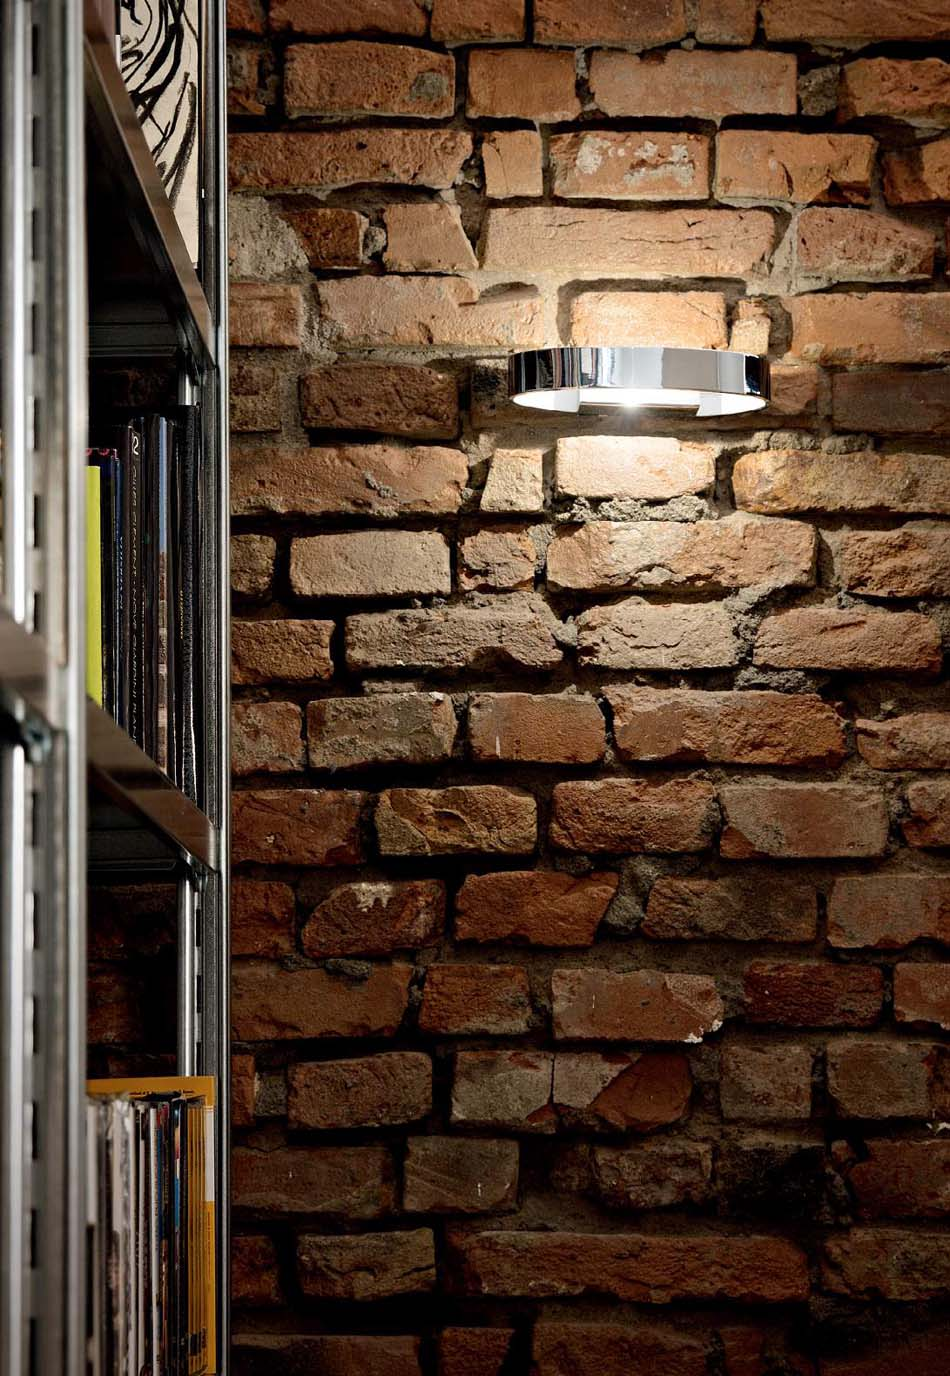 Lampade 49 soffitto parete Ideal Lux Zed – Toscana Arredamenti